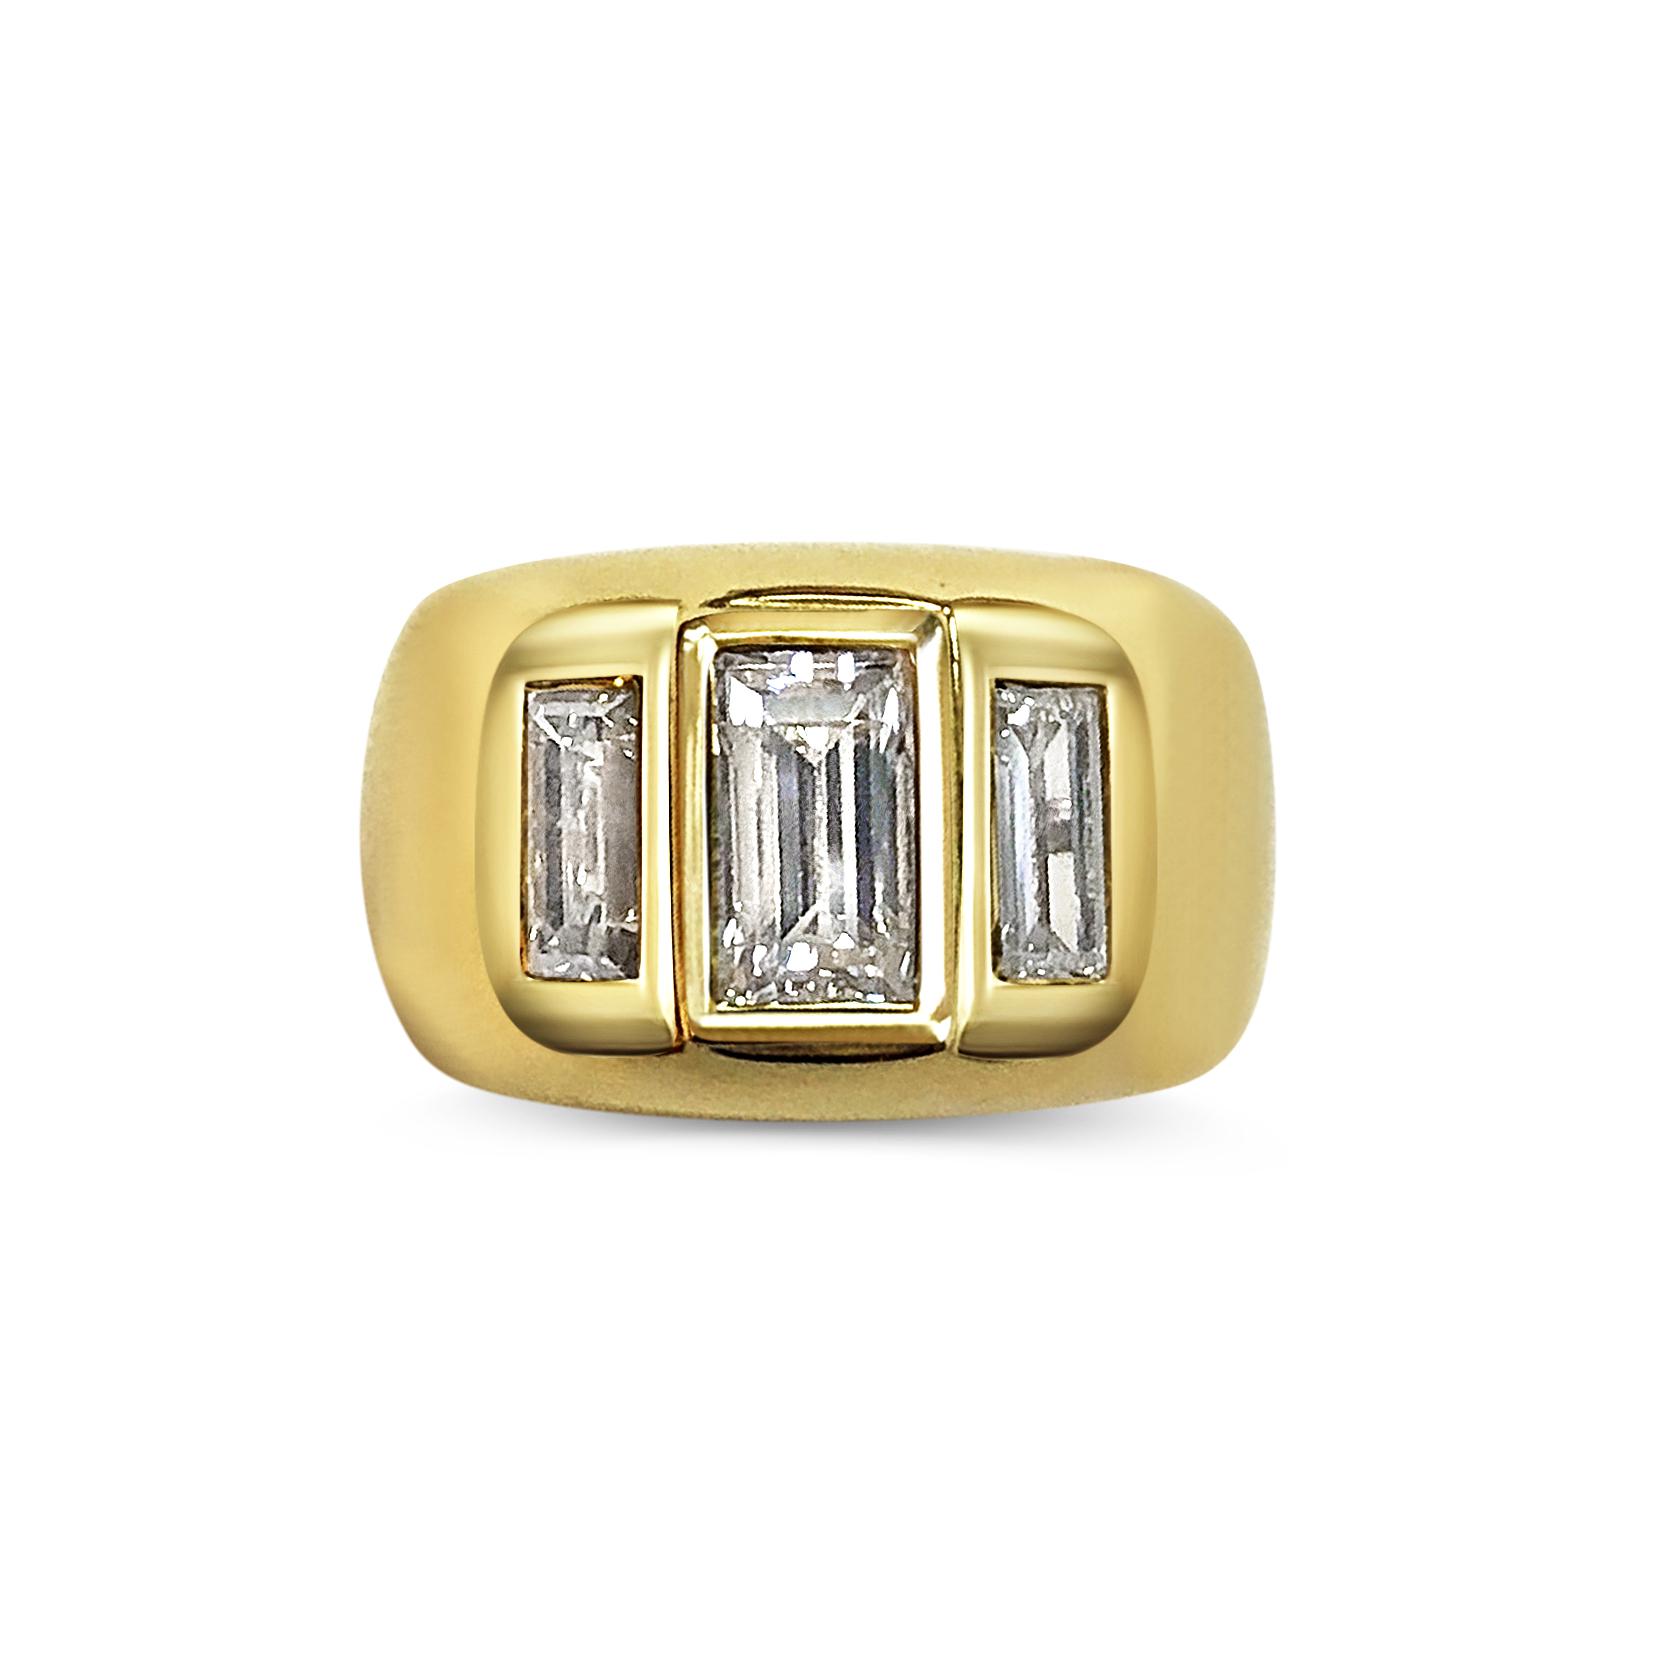 Baguette-cut diamond ring top view